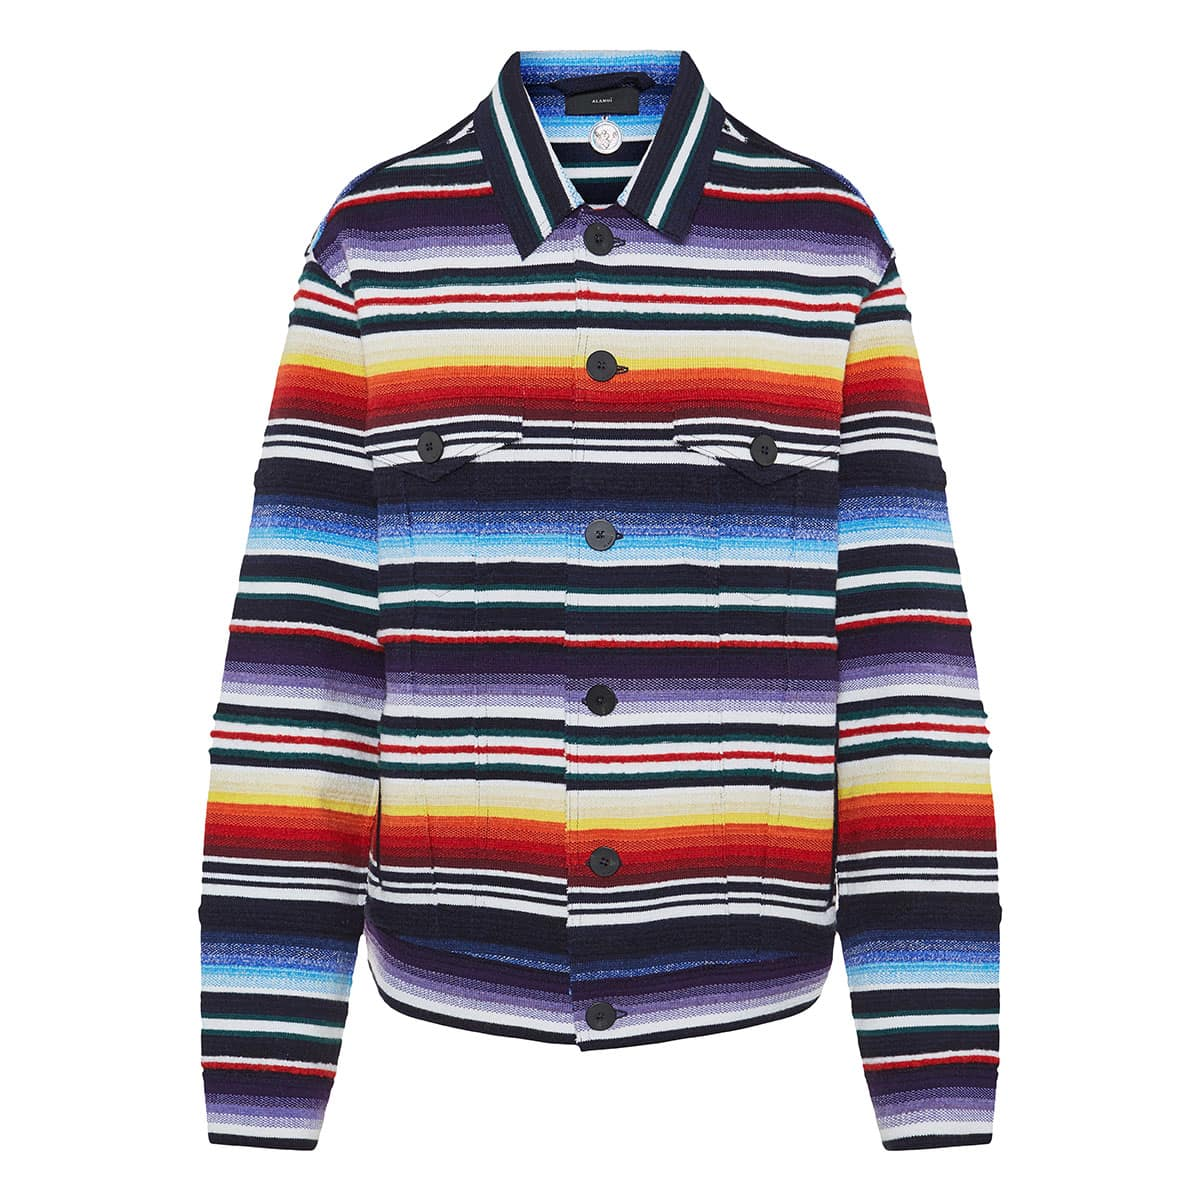 Sarape striped cashmere jacket